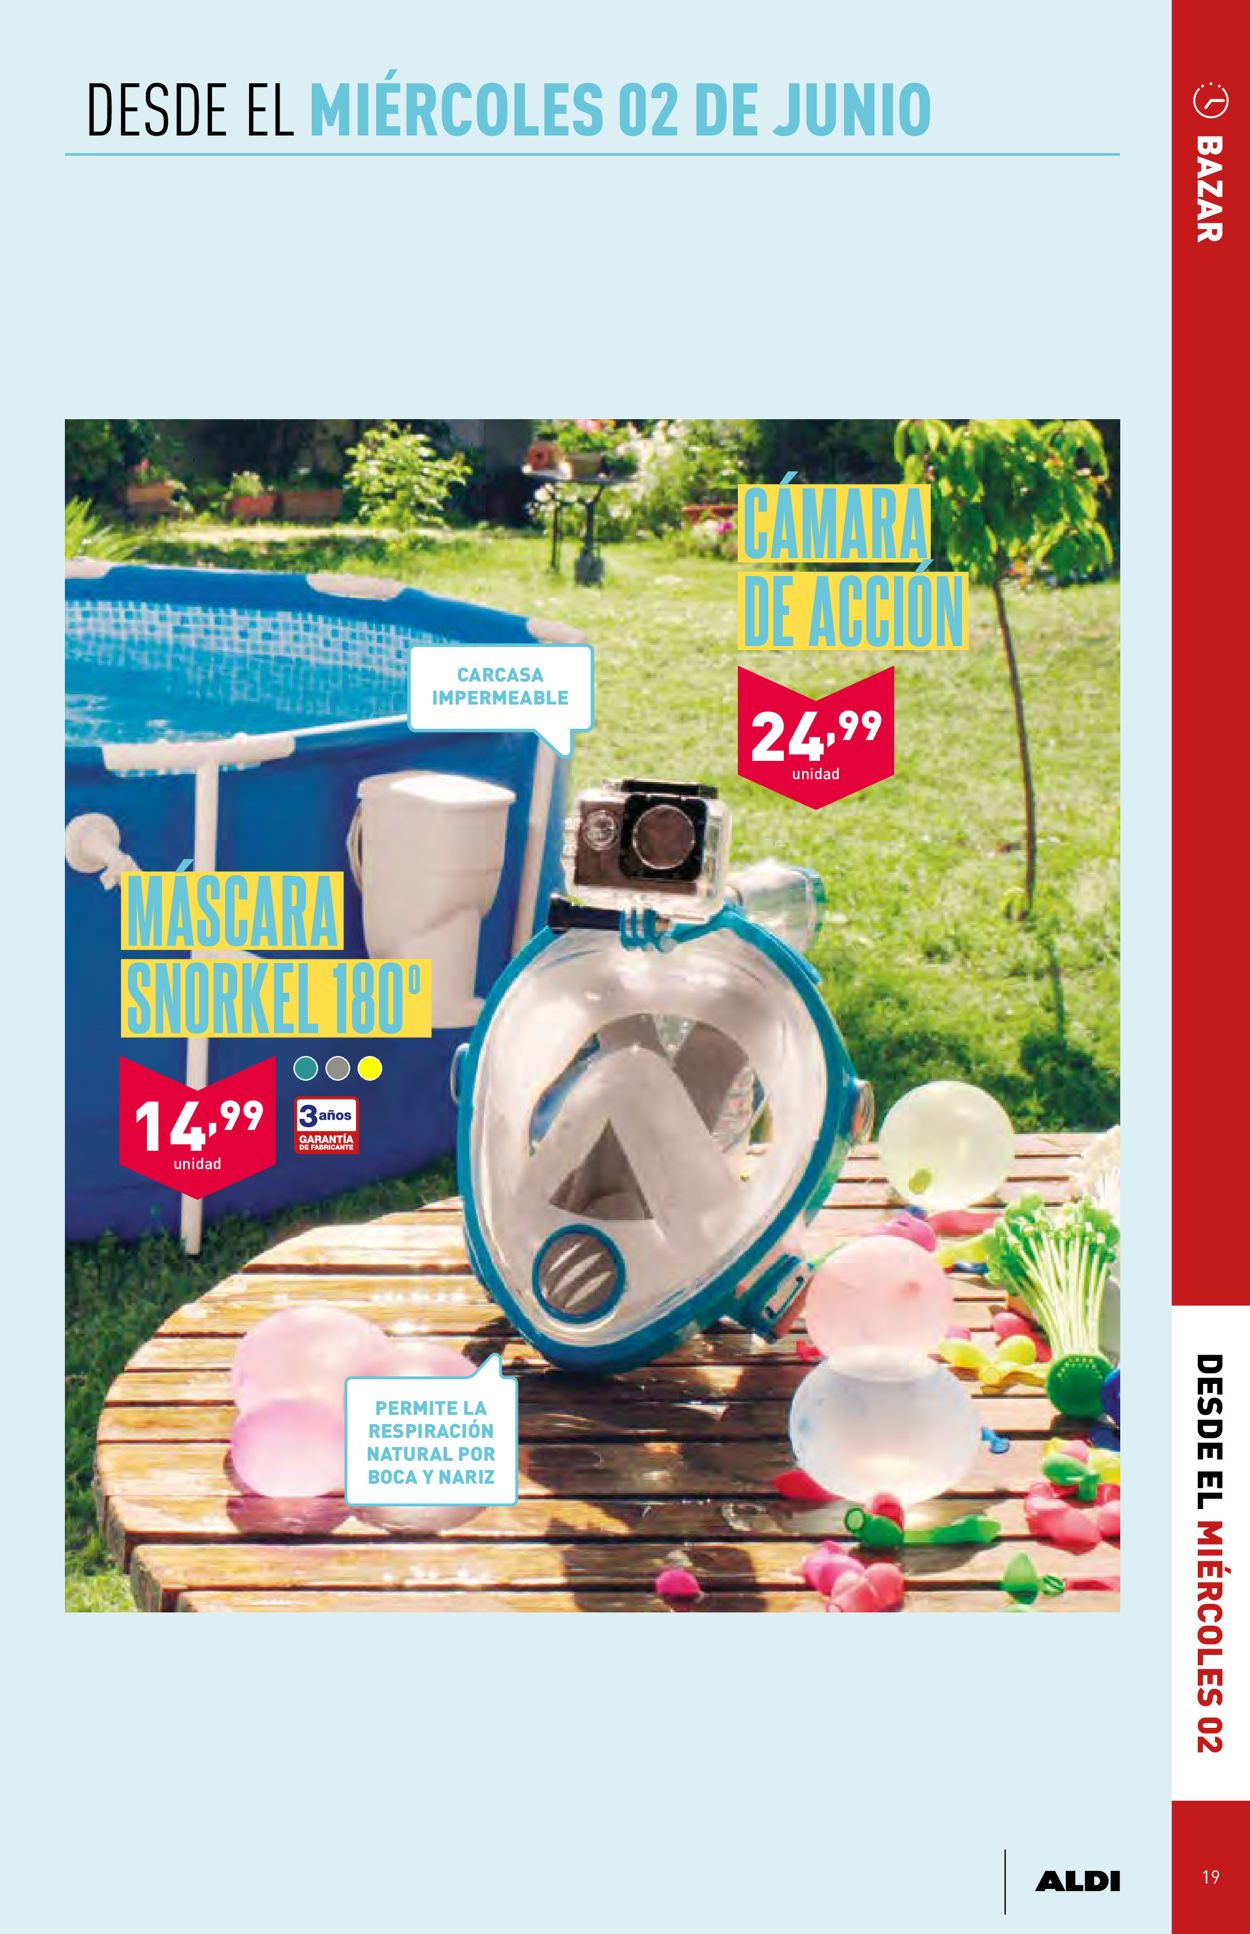 Aldi Folleto - 02.06-08.06.2021 (Página 19)